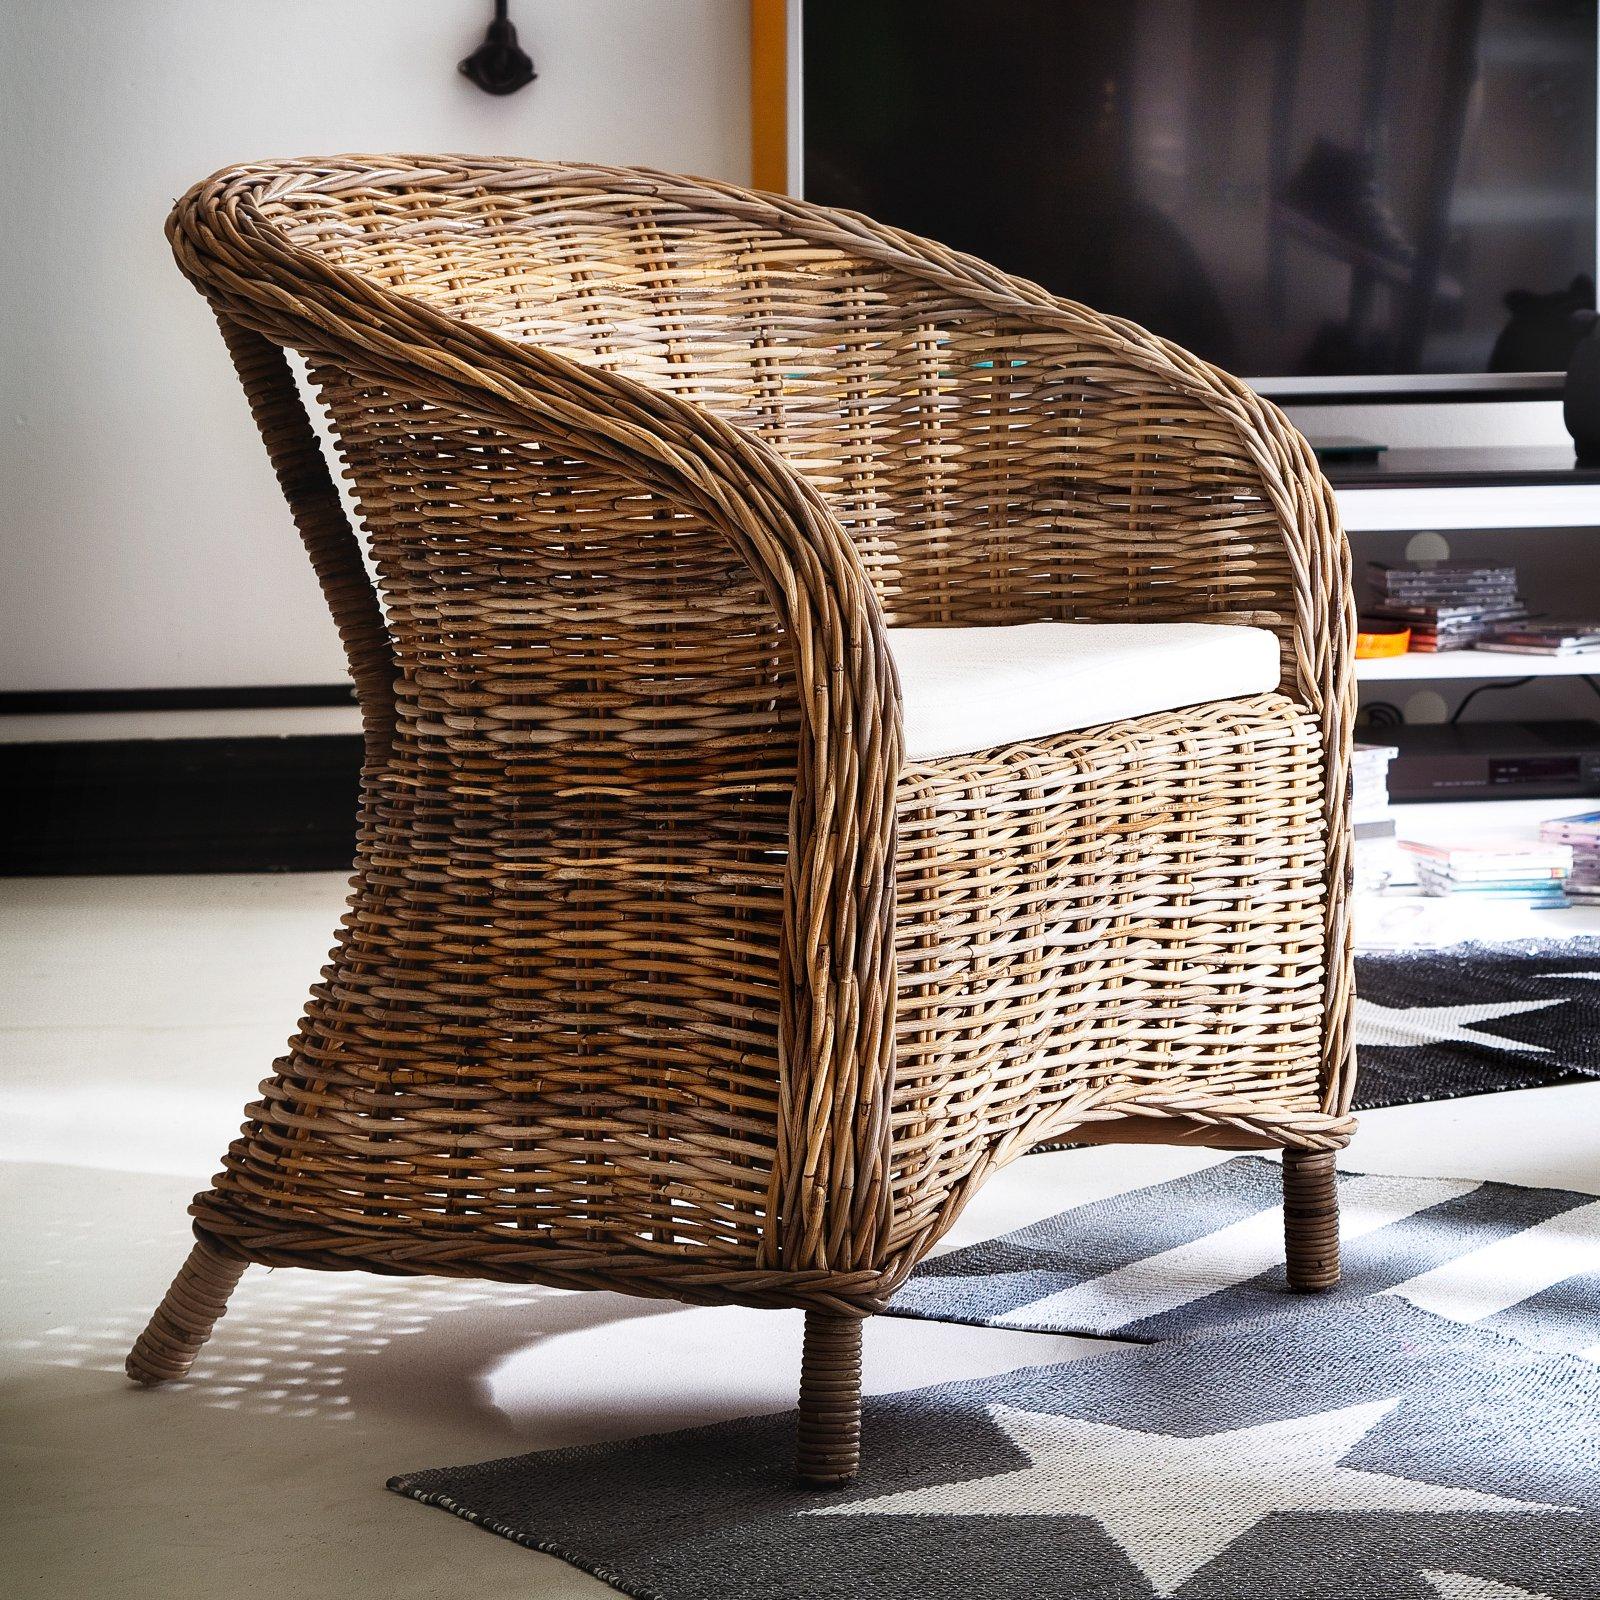 Nova Solo Wickerworks Bonsun Arm Chair - Set of 2